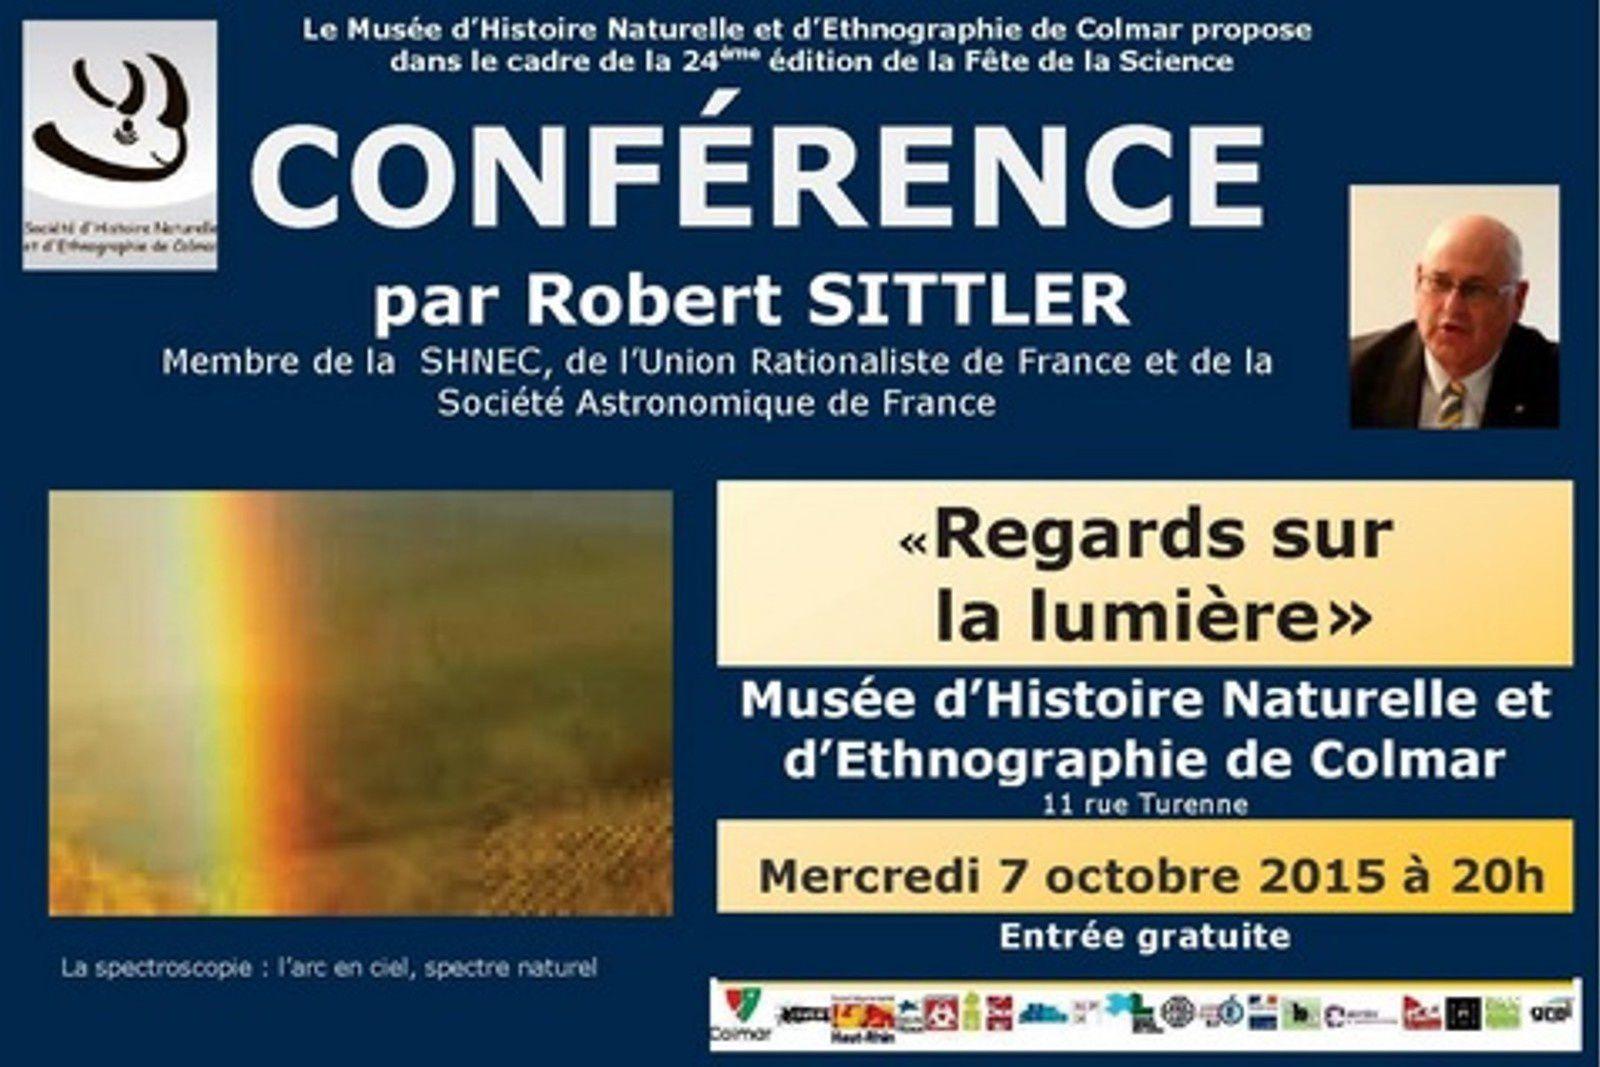 Mercredi 7, vendredi 9, samedi 10 octobre - Au Muséum d'Histoire naturelle de Colmar